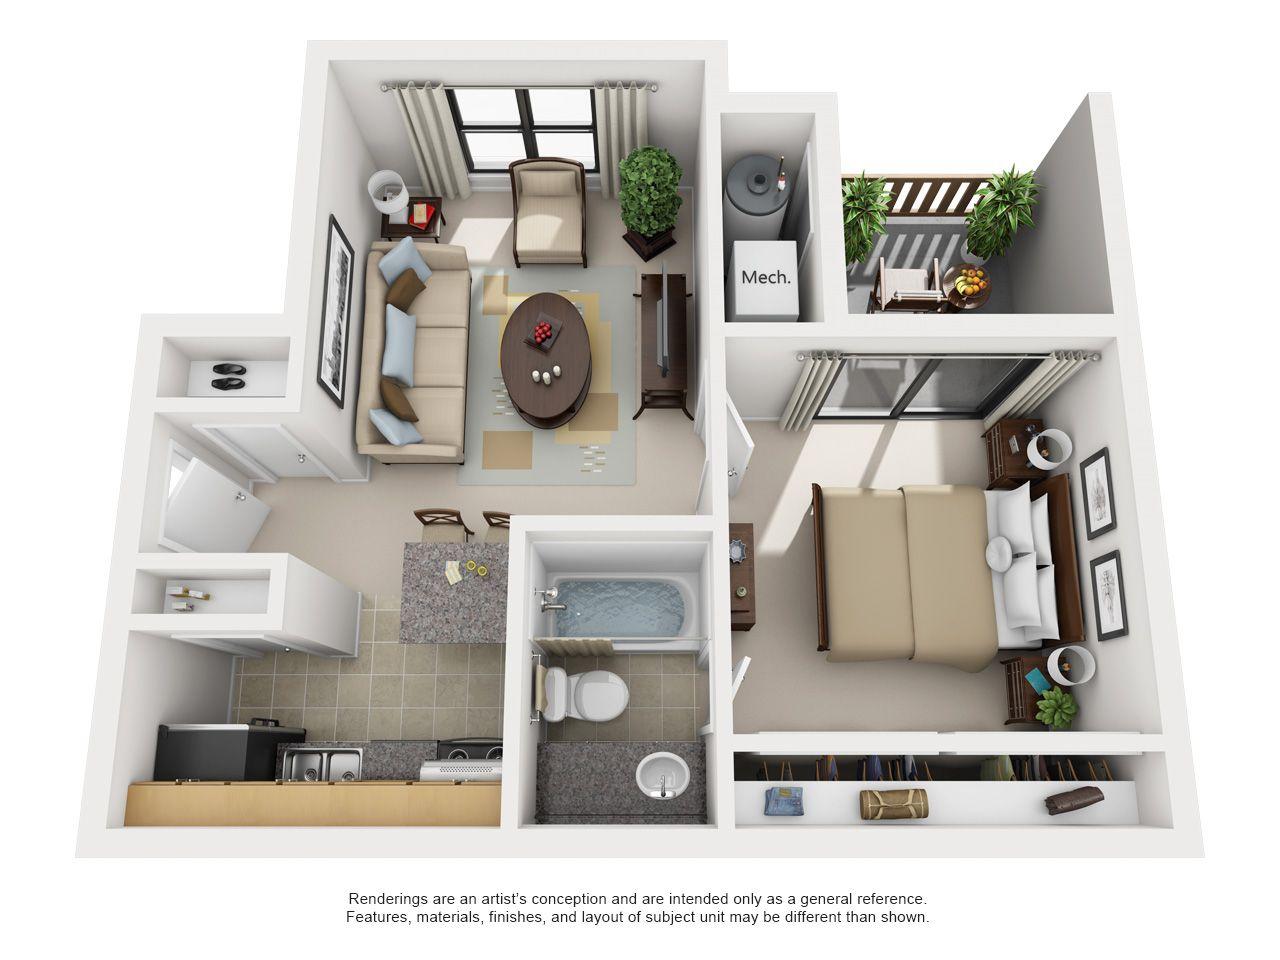 Studio One Two Bedroom Apartments In Smyrna Ga Smyrna Georgia Apartment Steadfast House Floor Design Tiny House Floor Plans Apartment Layout